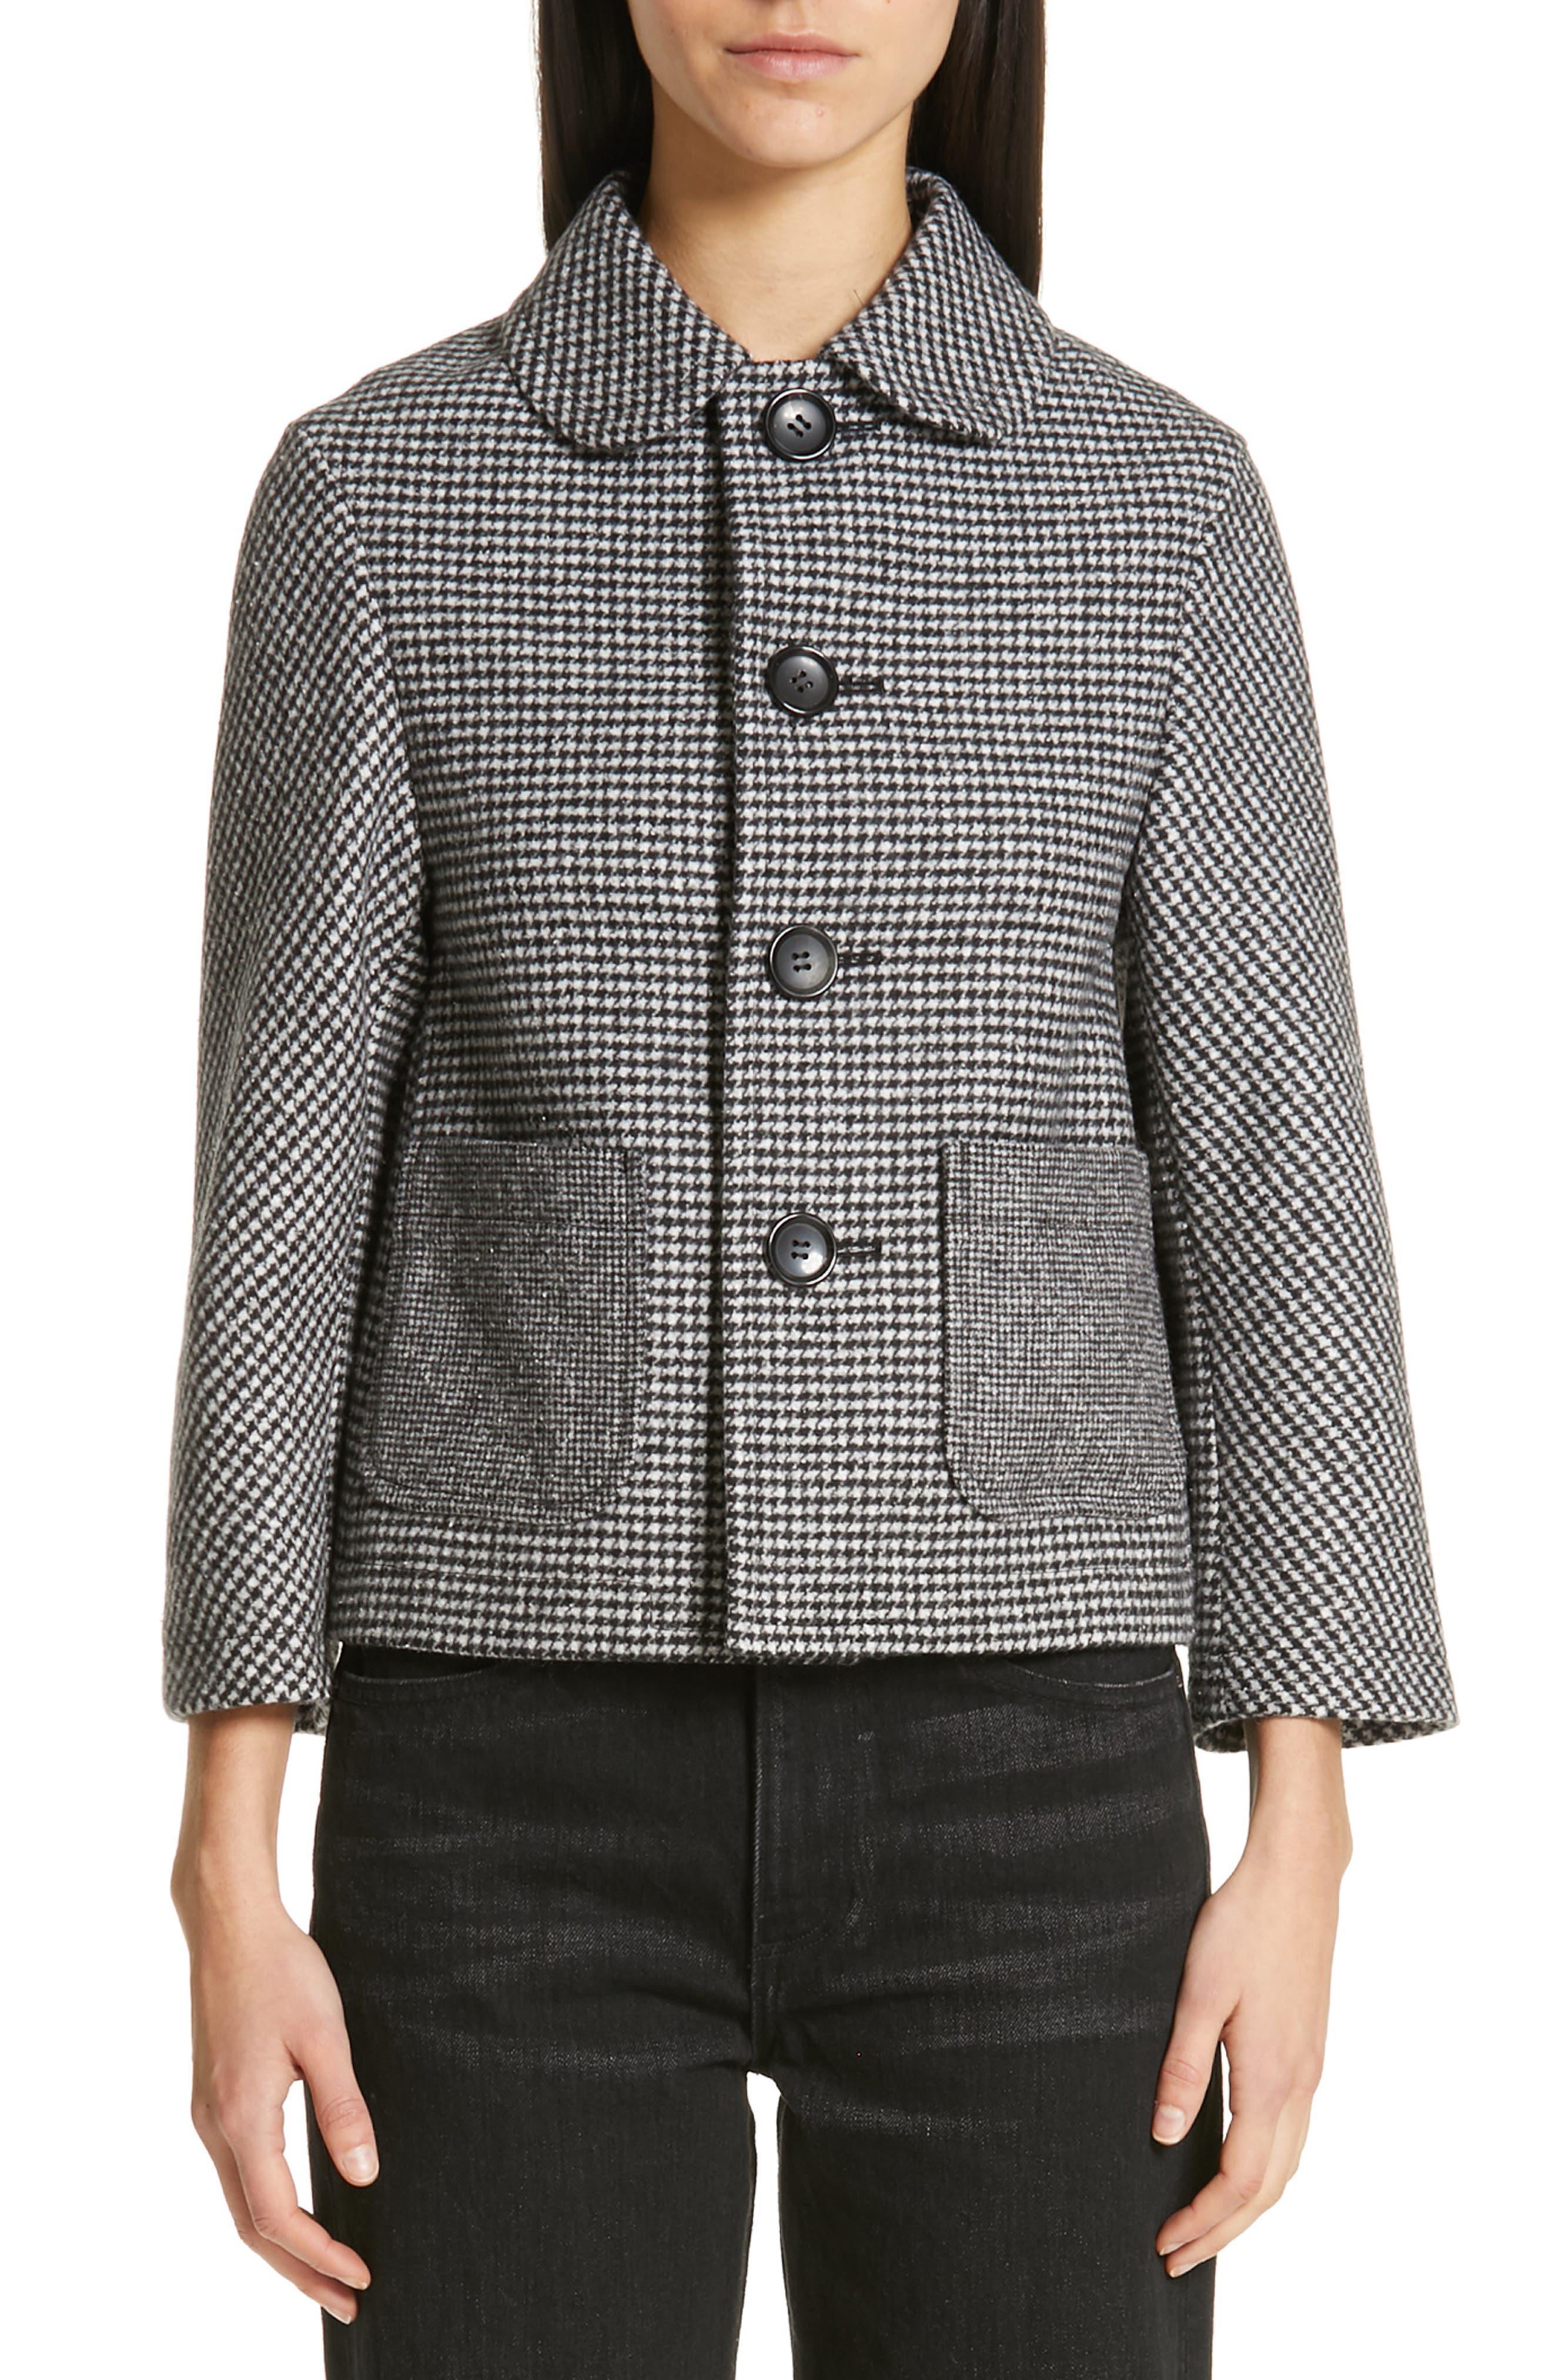 TRICOT COMME DES GARÇONS Houndstooth Crop Jacket, Main, color, LARGE X SMALL